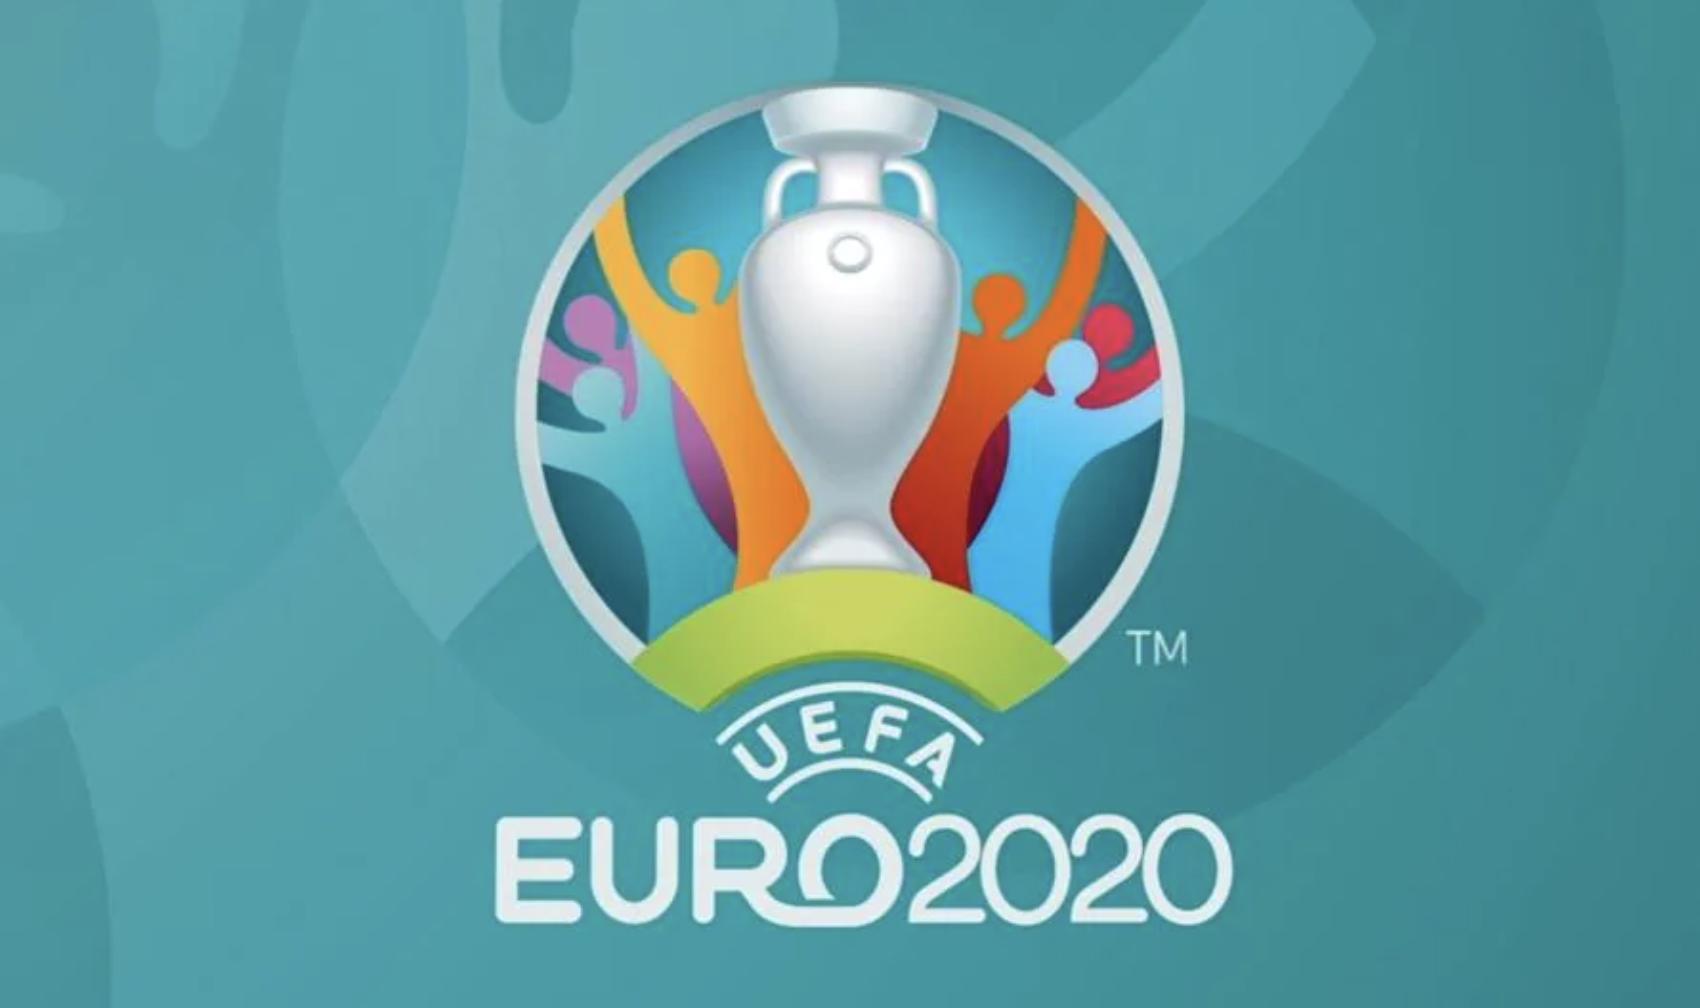 EURO 2020: Turkey, Croatia and North Macedonia started with defeats